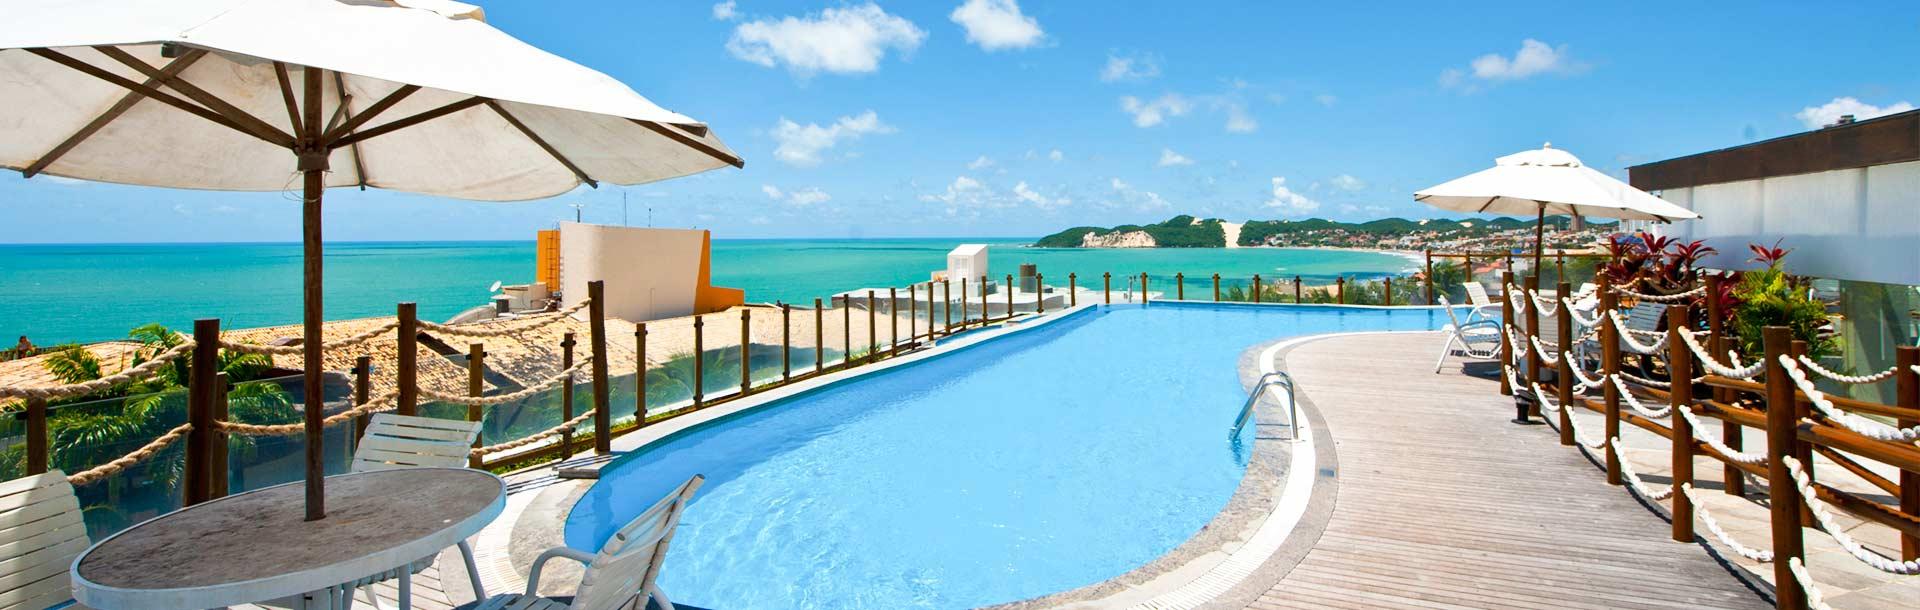 slider-interno-pontalmar-praia-hotel-localizacao